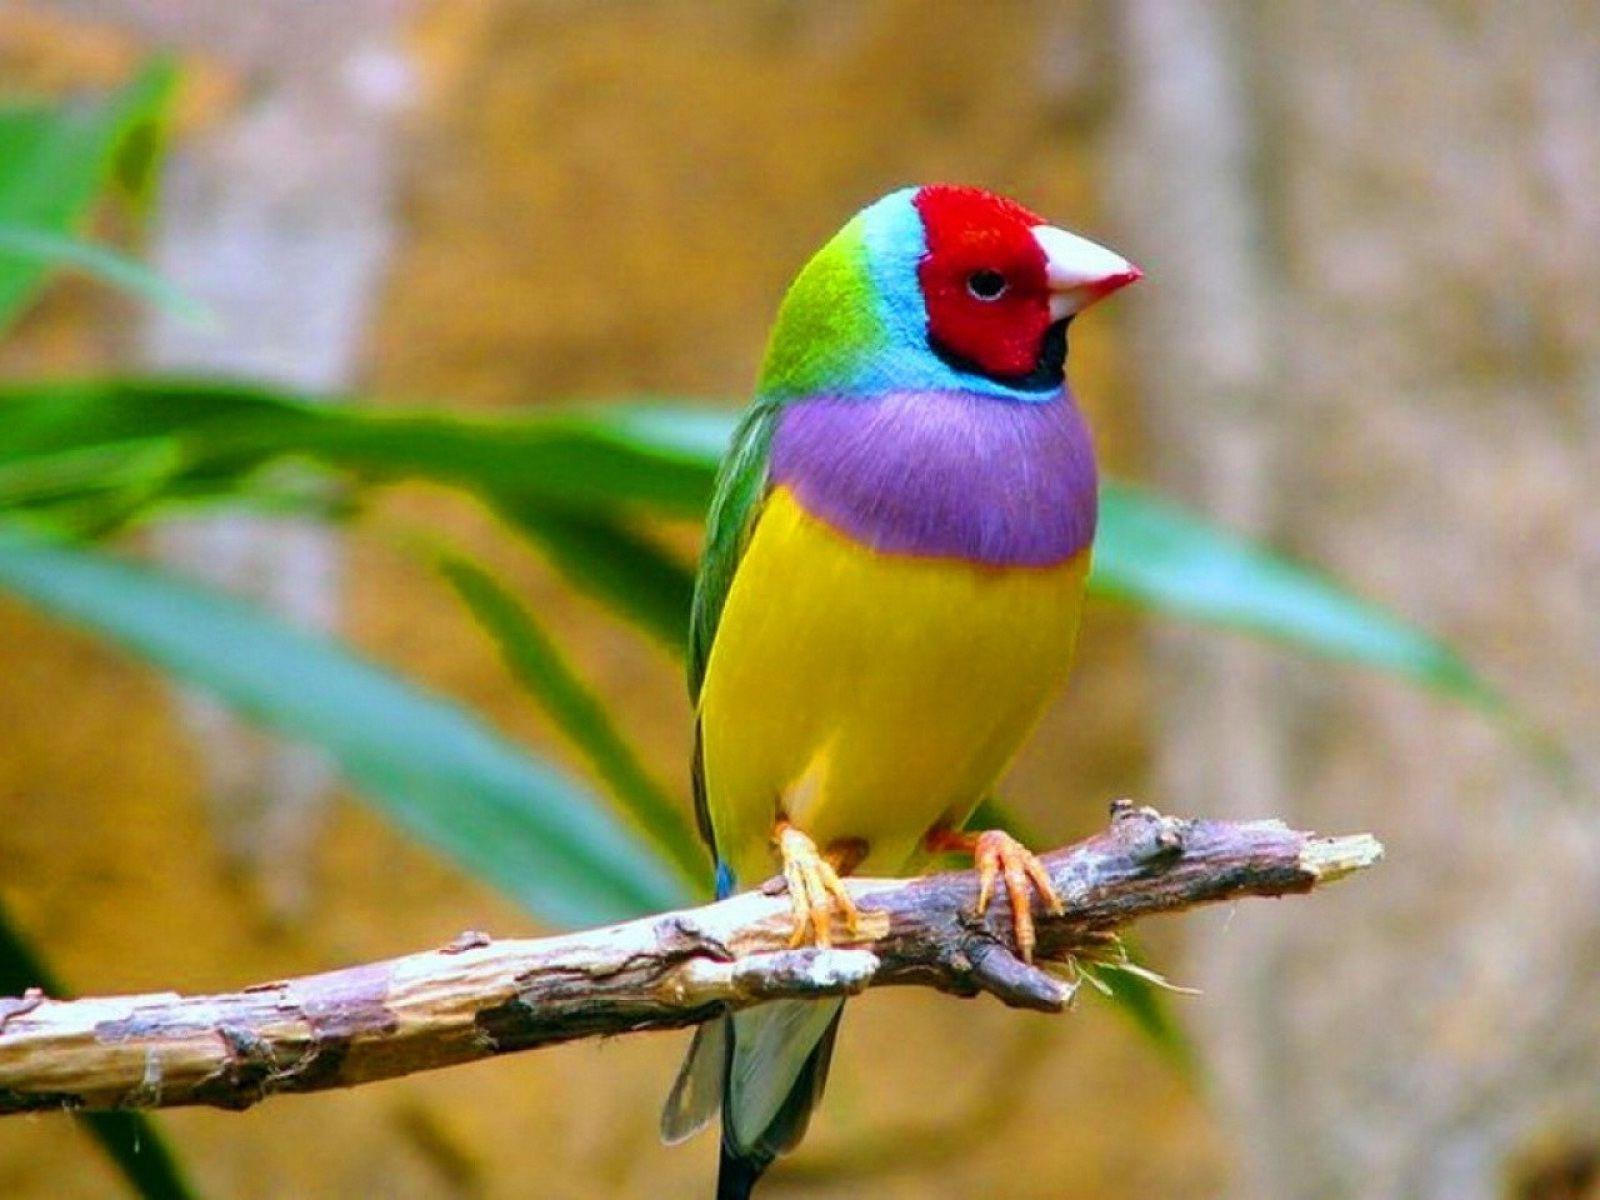 cute birds wallpaper free download